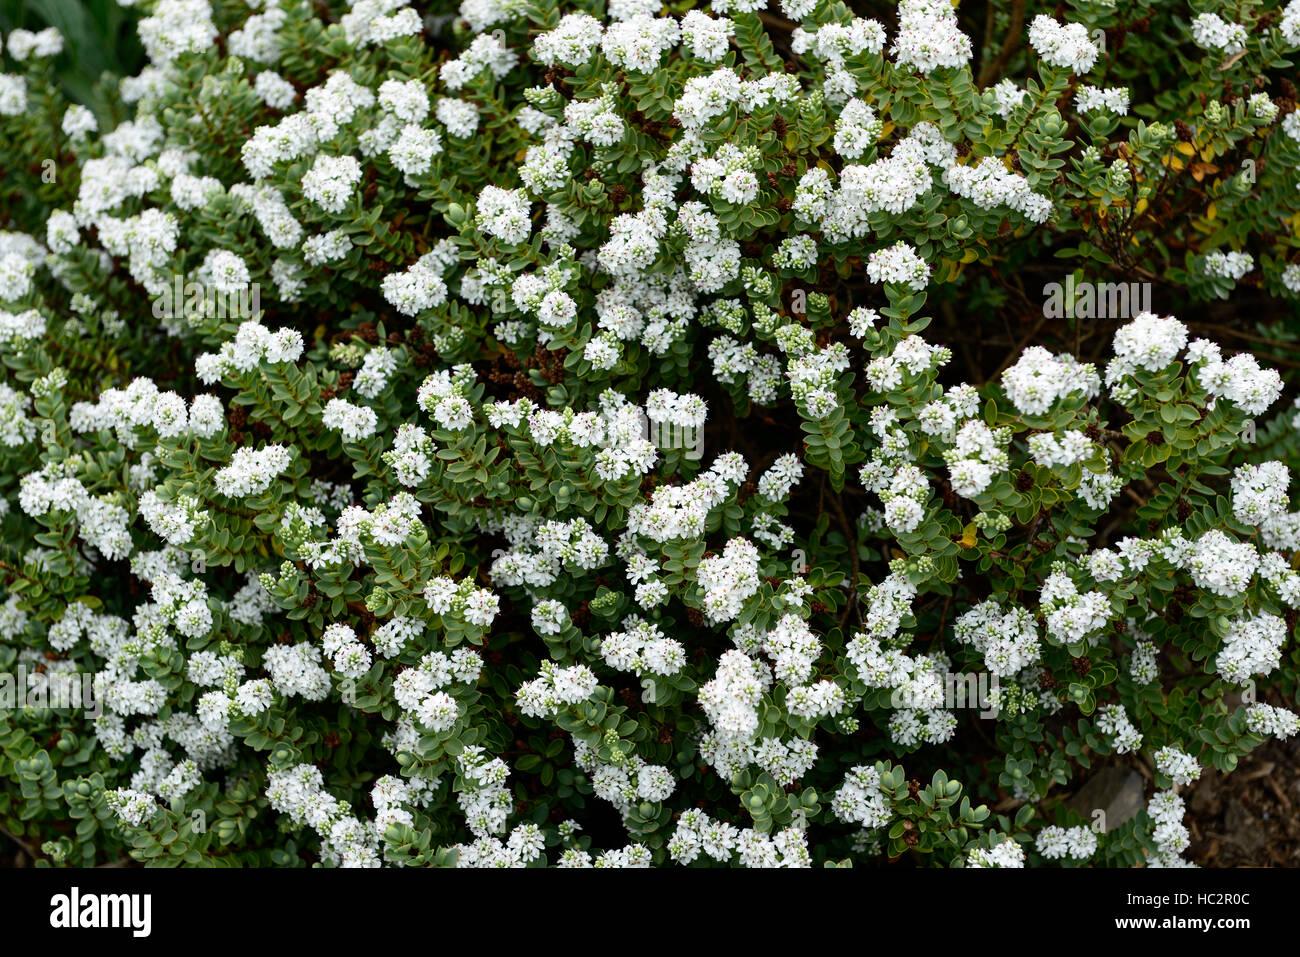 Hebe Cockayniana Hebes White Flower Flowers Flowering Shrub Shrubs